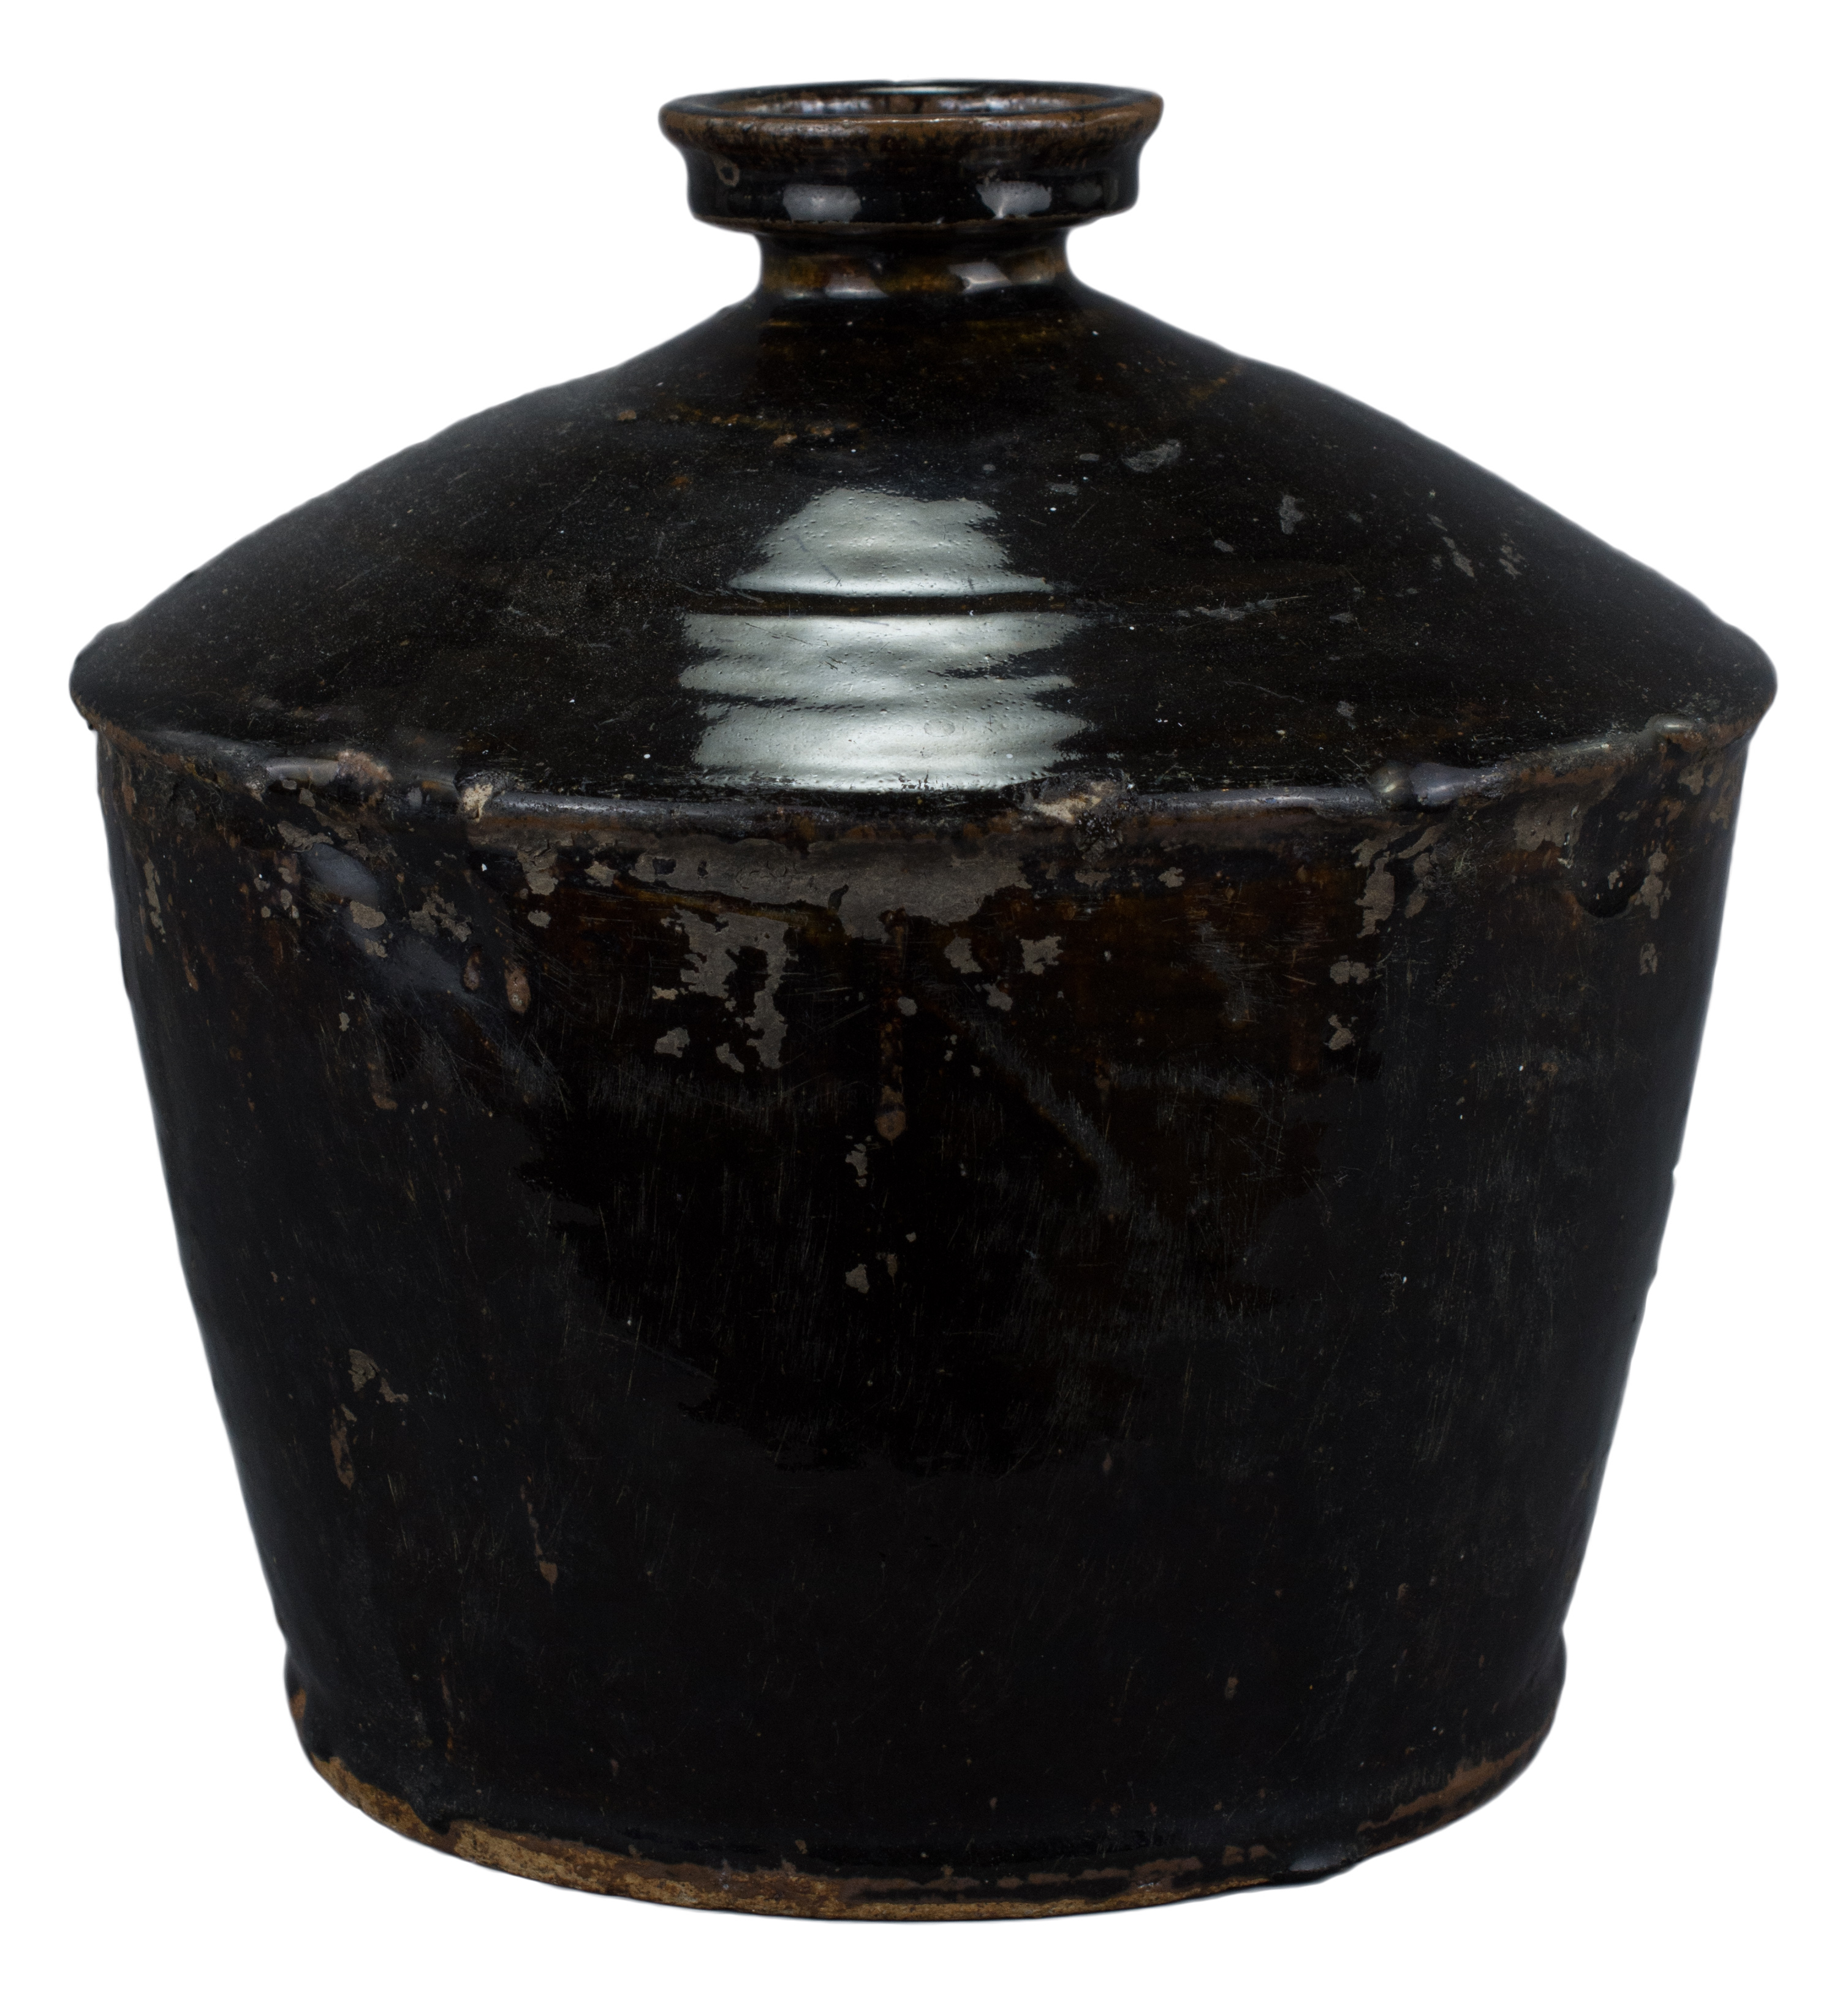 Lot 13 - A Chinese Yuan / Ming Dynasty Henan Glazed Stoneware Jar